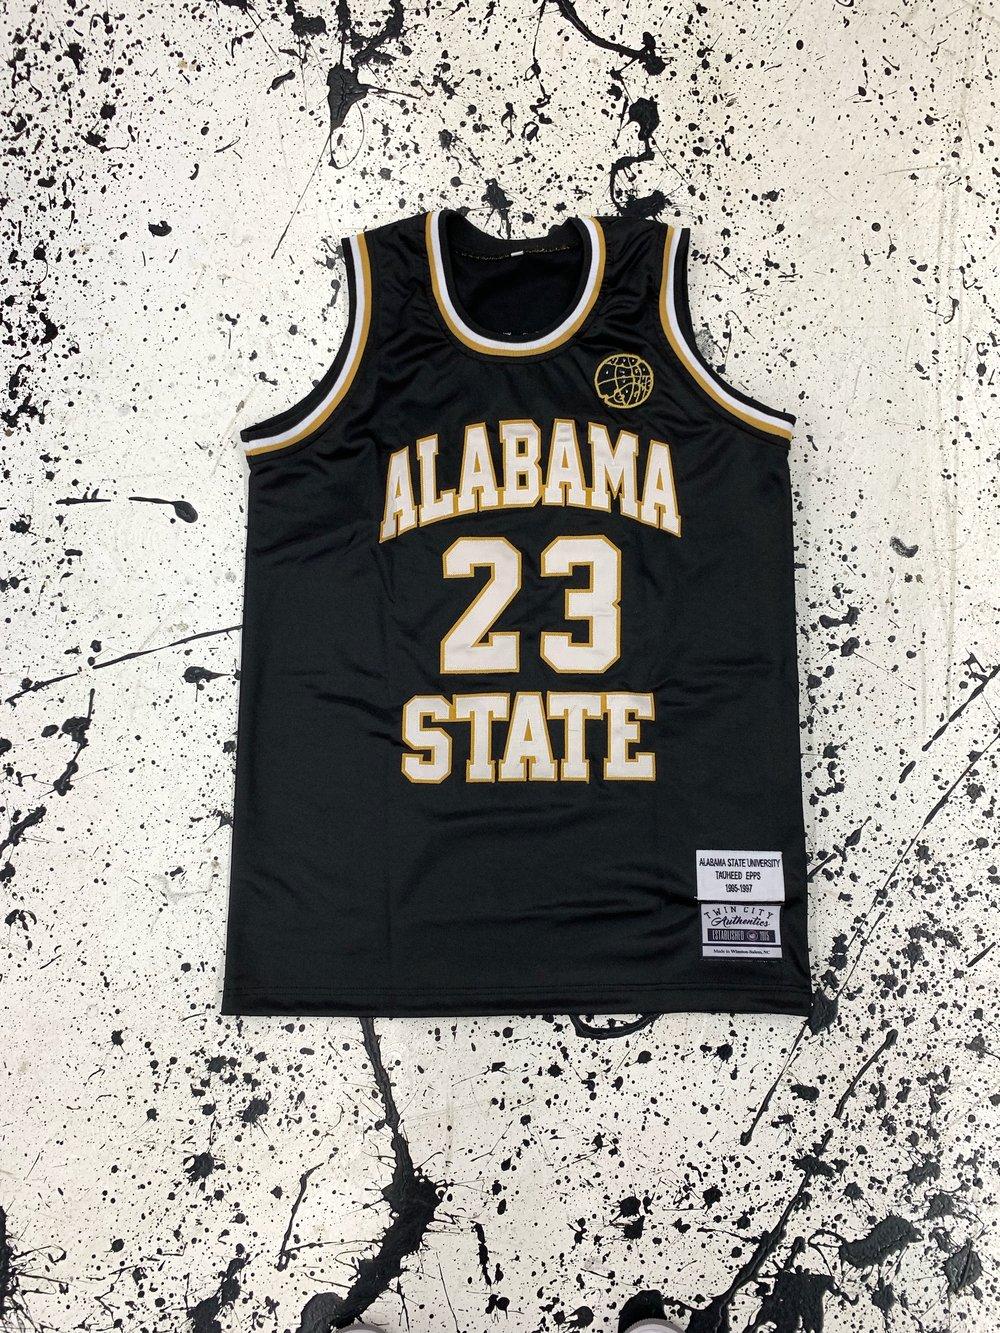 Image of Tauheed Epps (2Chainz) Alabama State custom